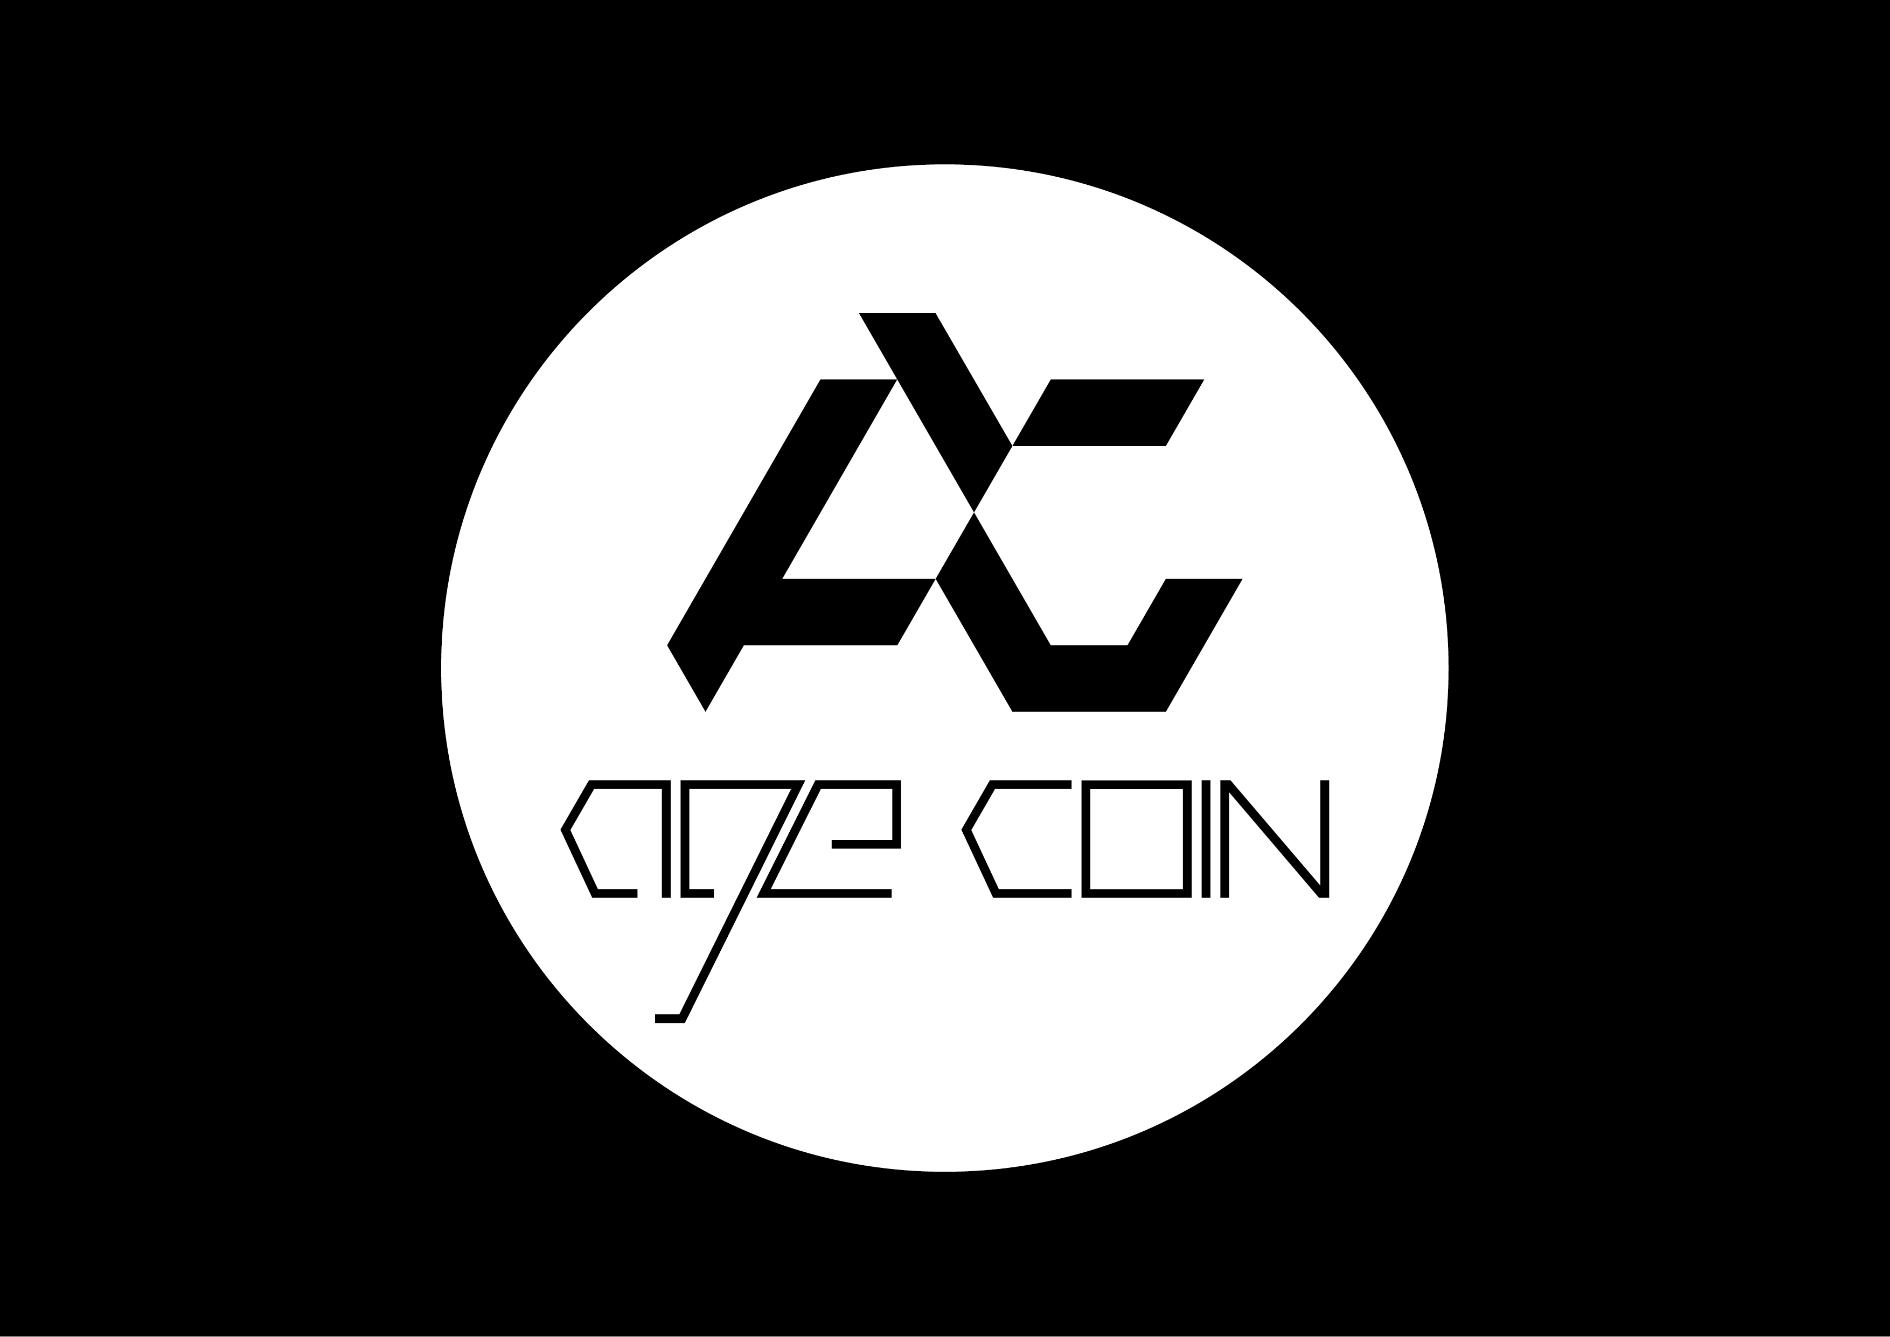 AC age COIN